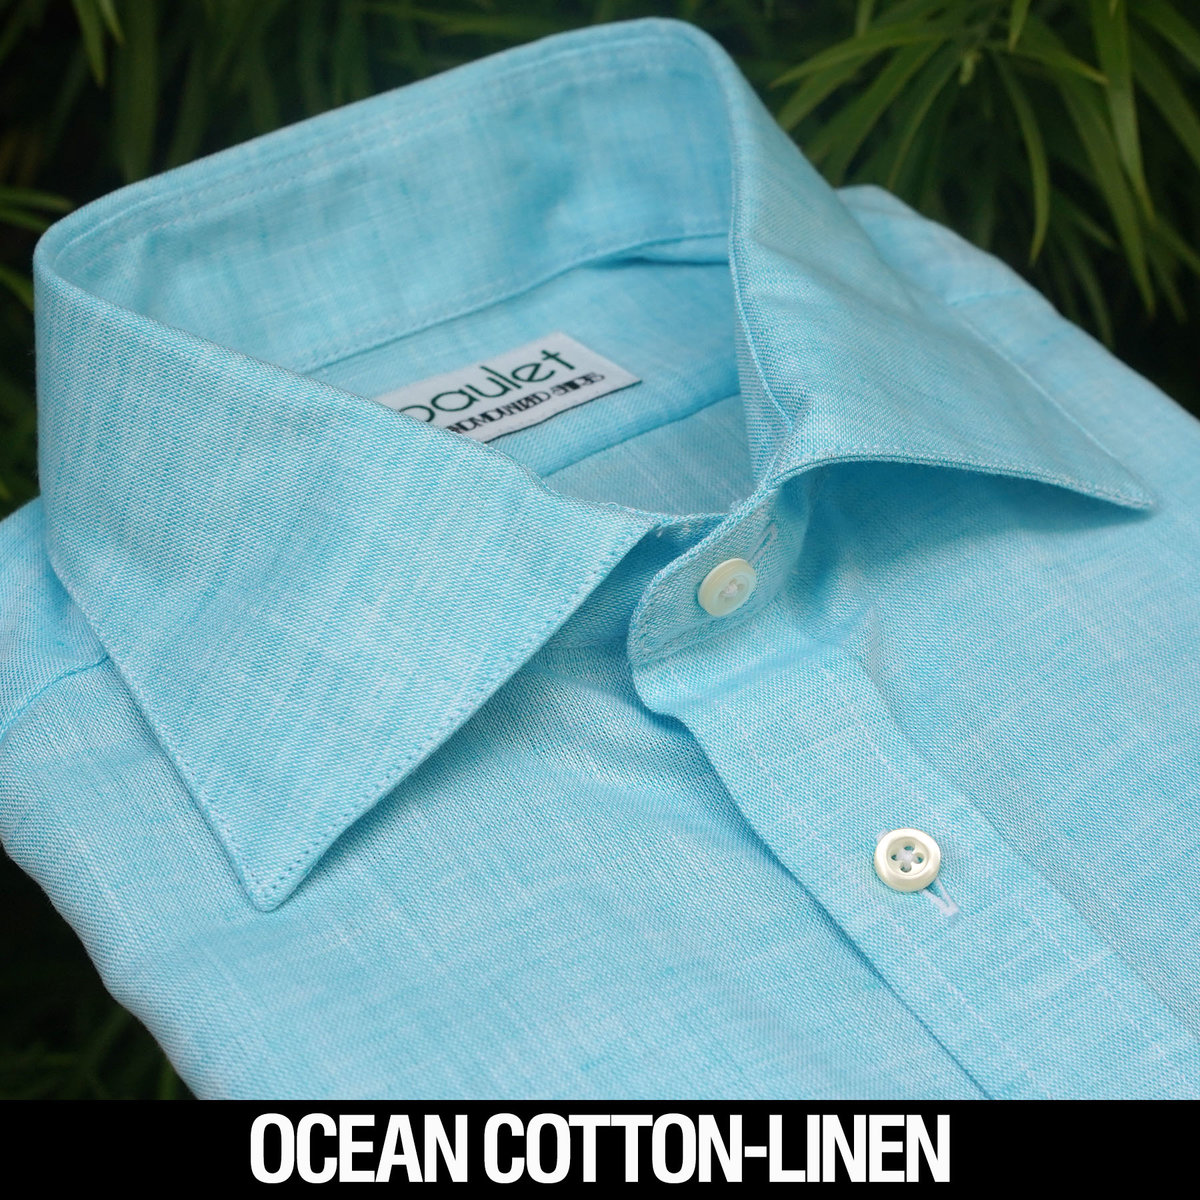 Ocean Cotton-Linen.jpg